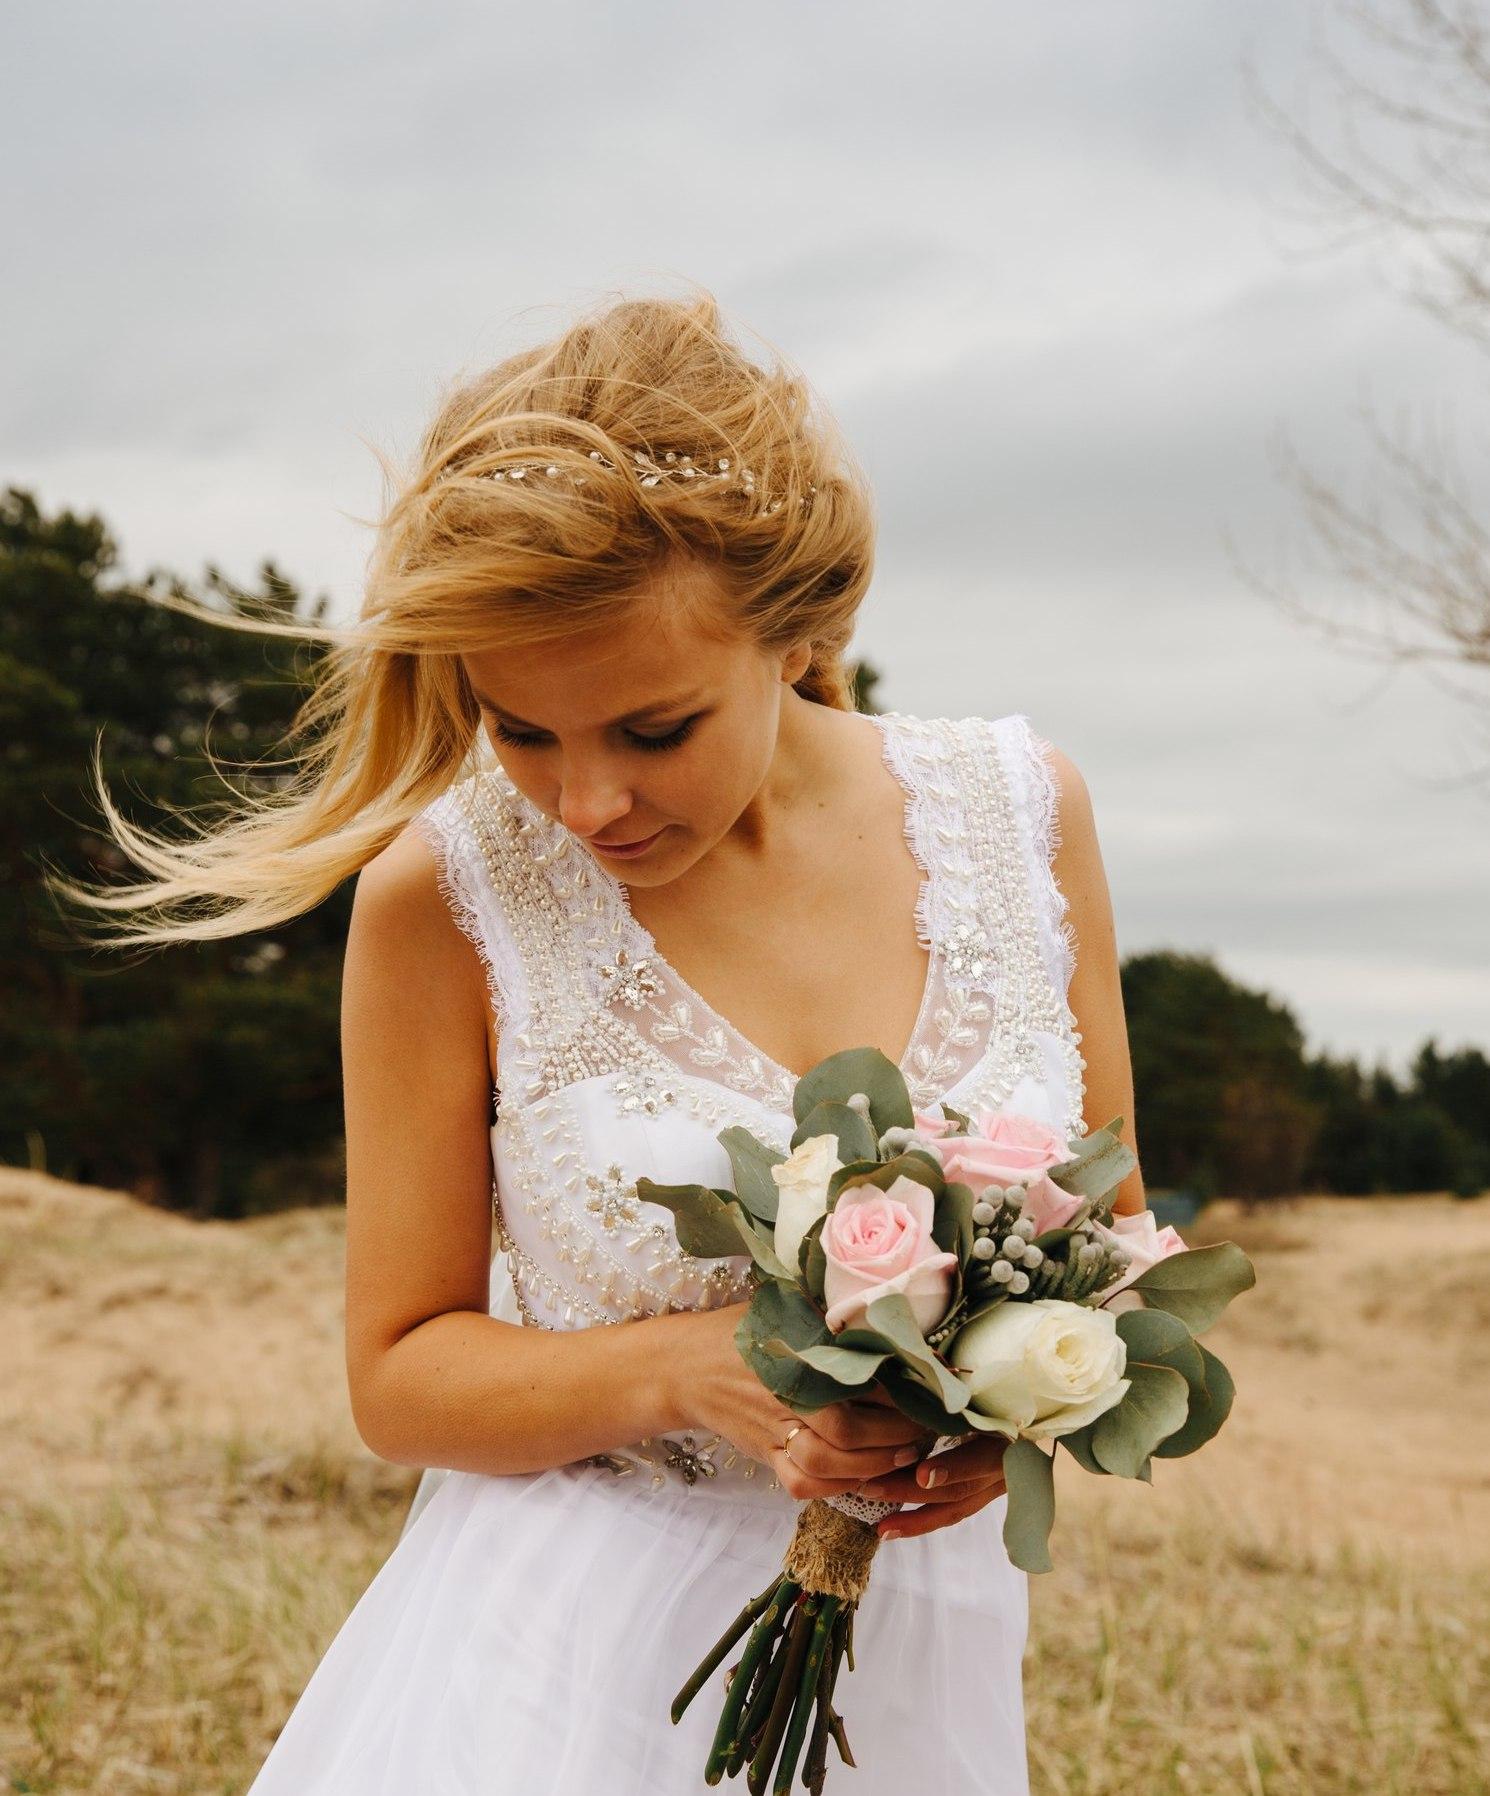 dostavka-tsvetov-tseni-na-svadebnie-buketi-v-spb-oranzh-tsvetov-novosibirske